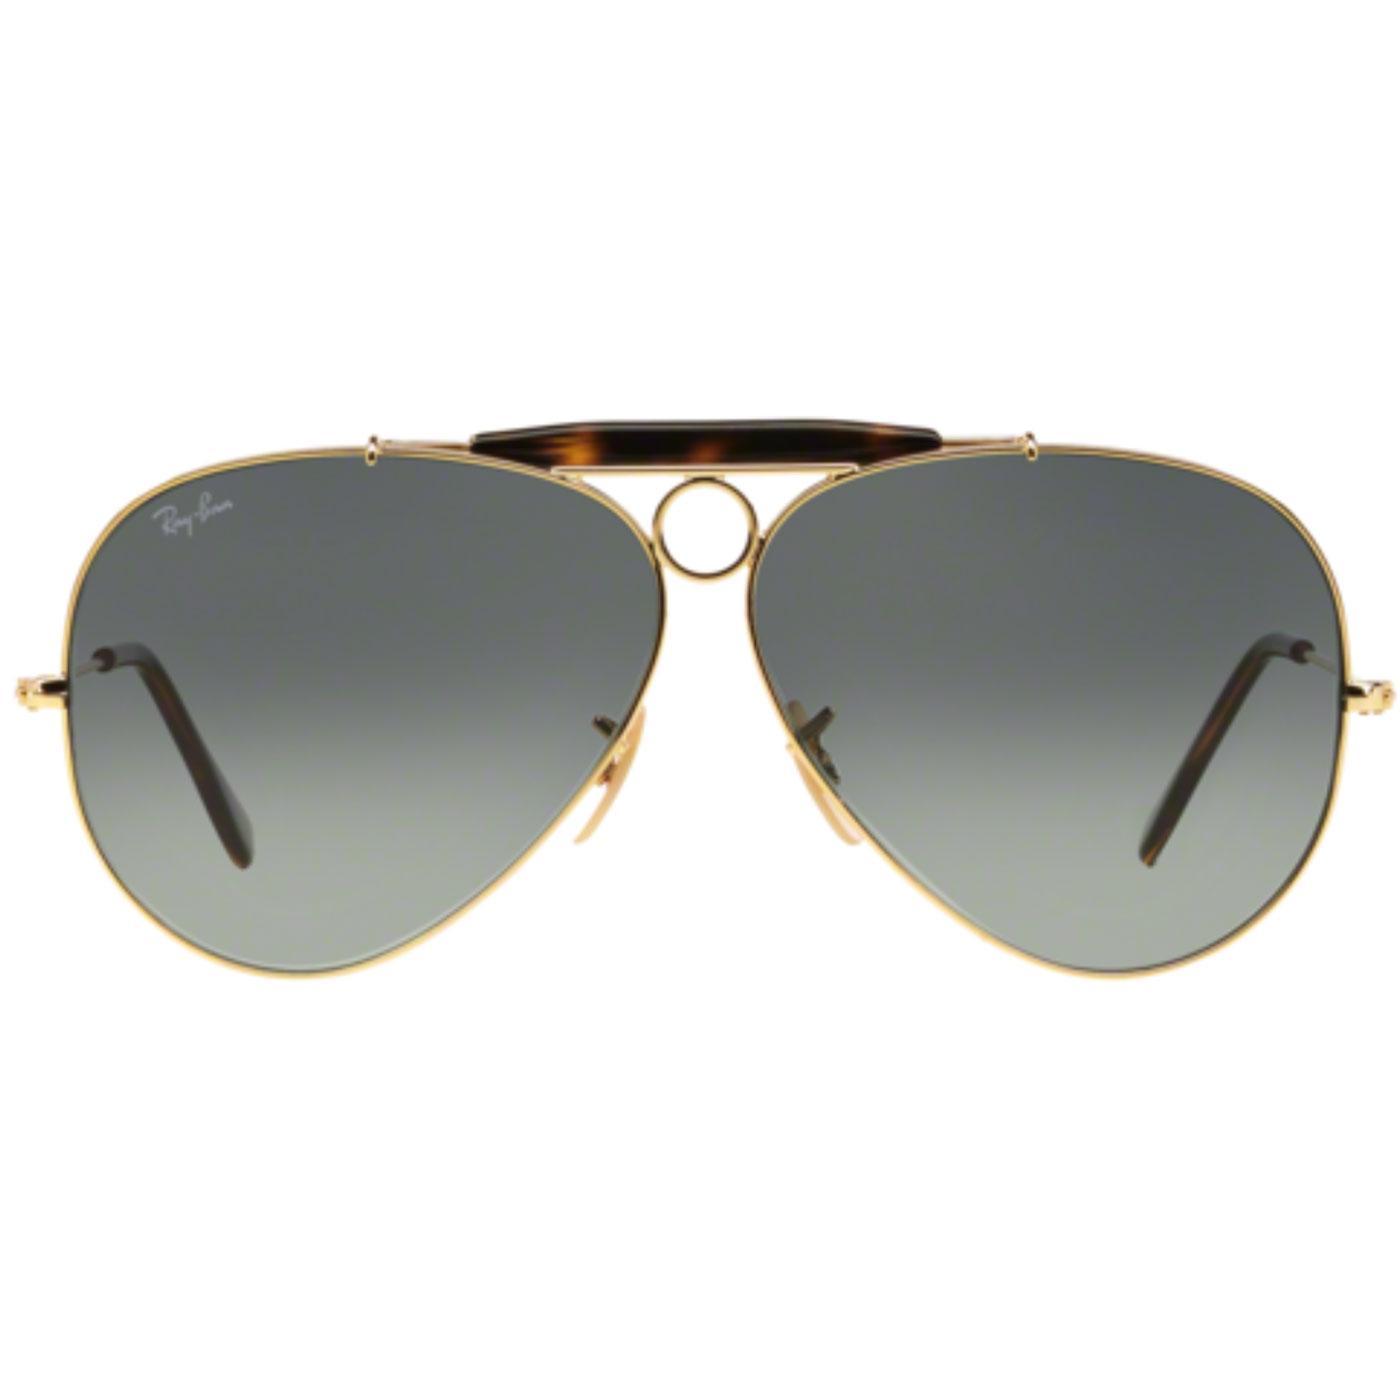 Shooter RAY-BAN Retro 70s Mod Aviator Sunglasses